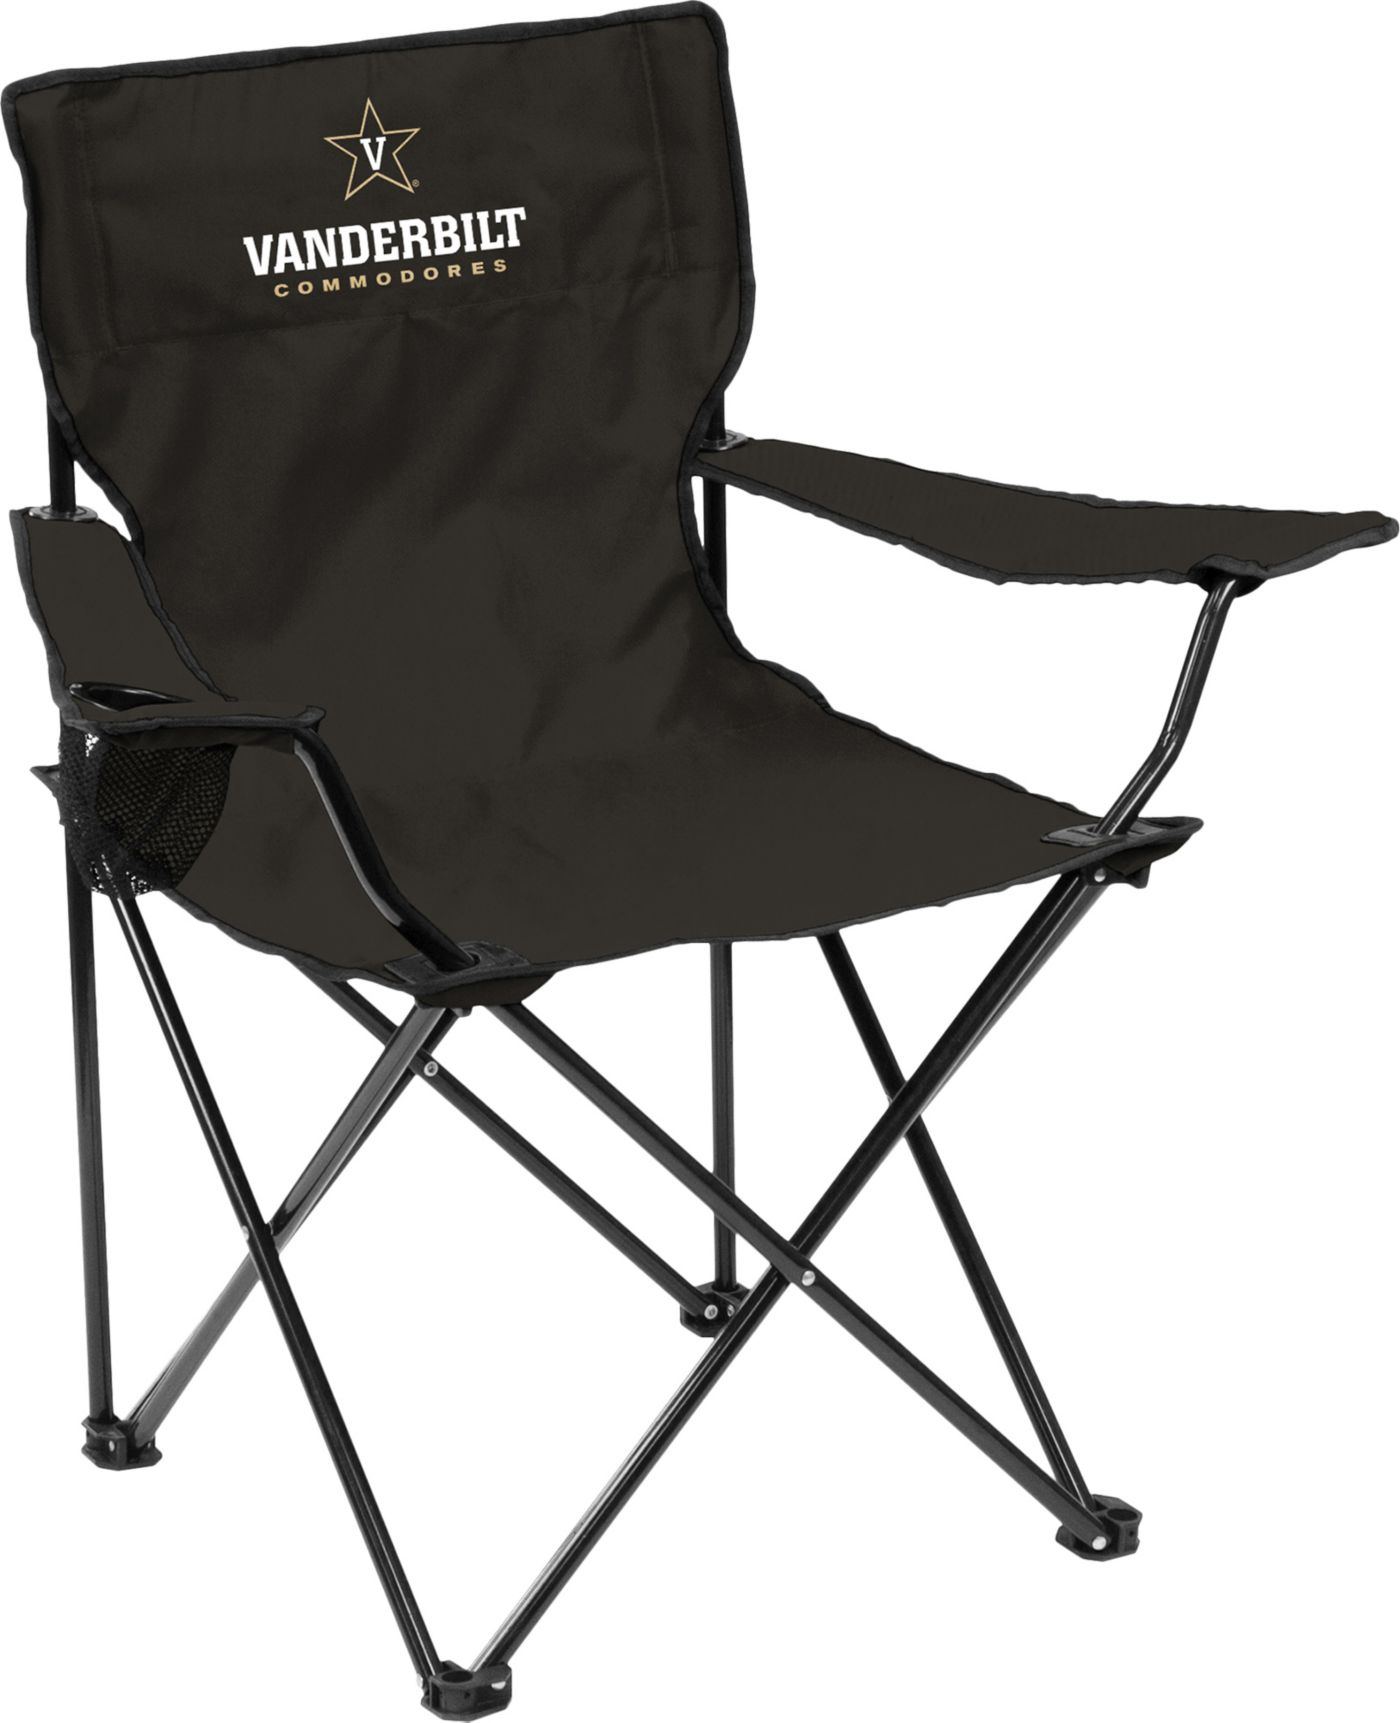 Vanderbilt Commodores Team-Colored Canvas Chair